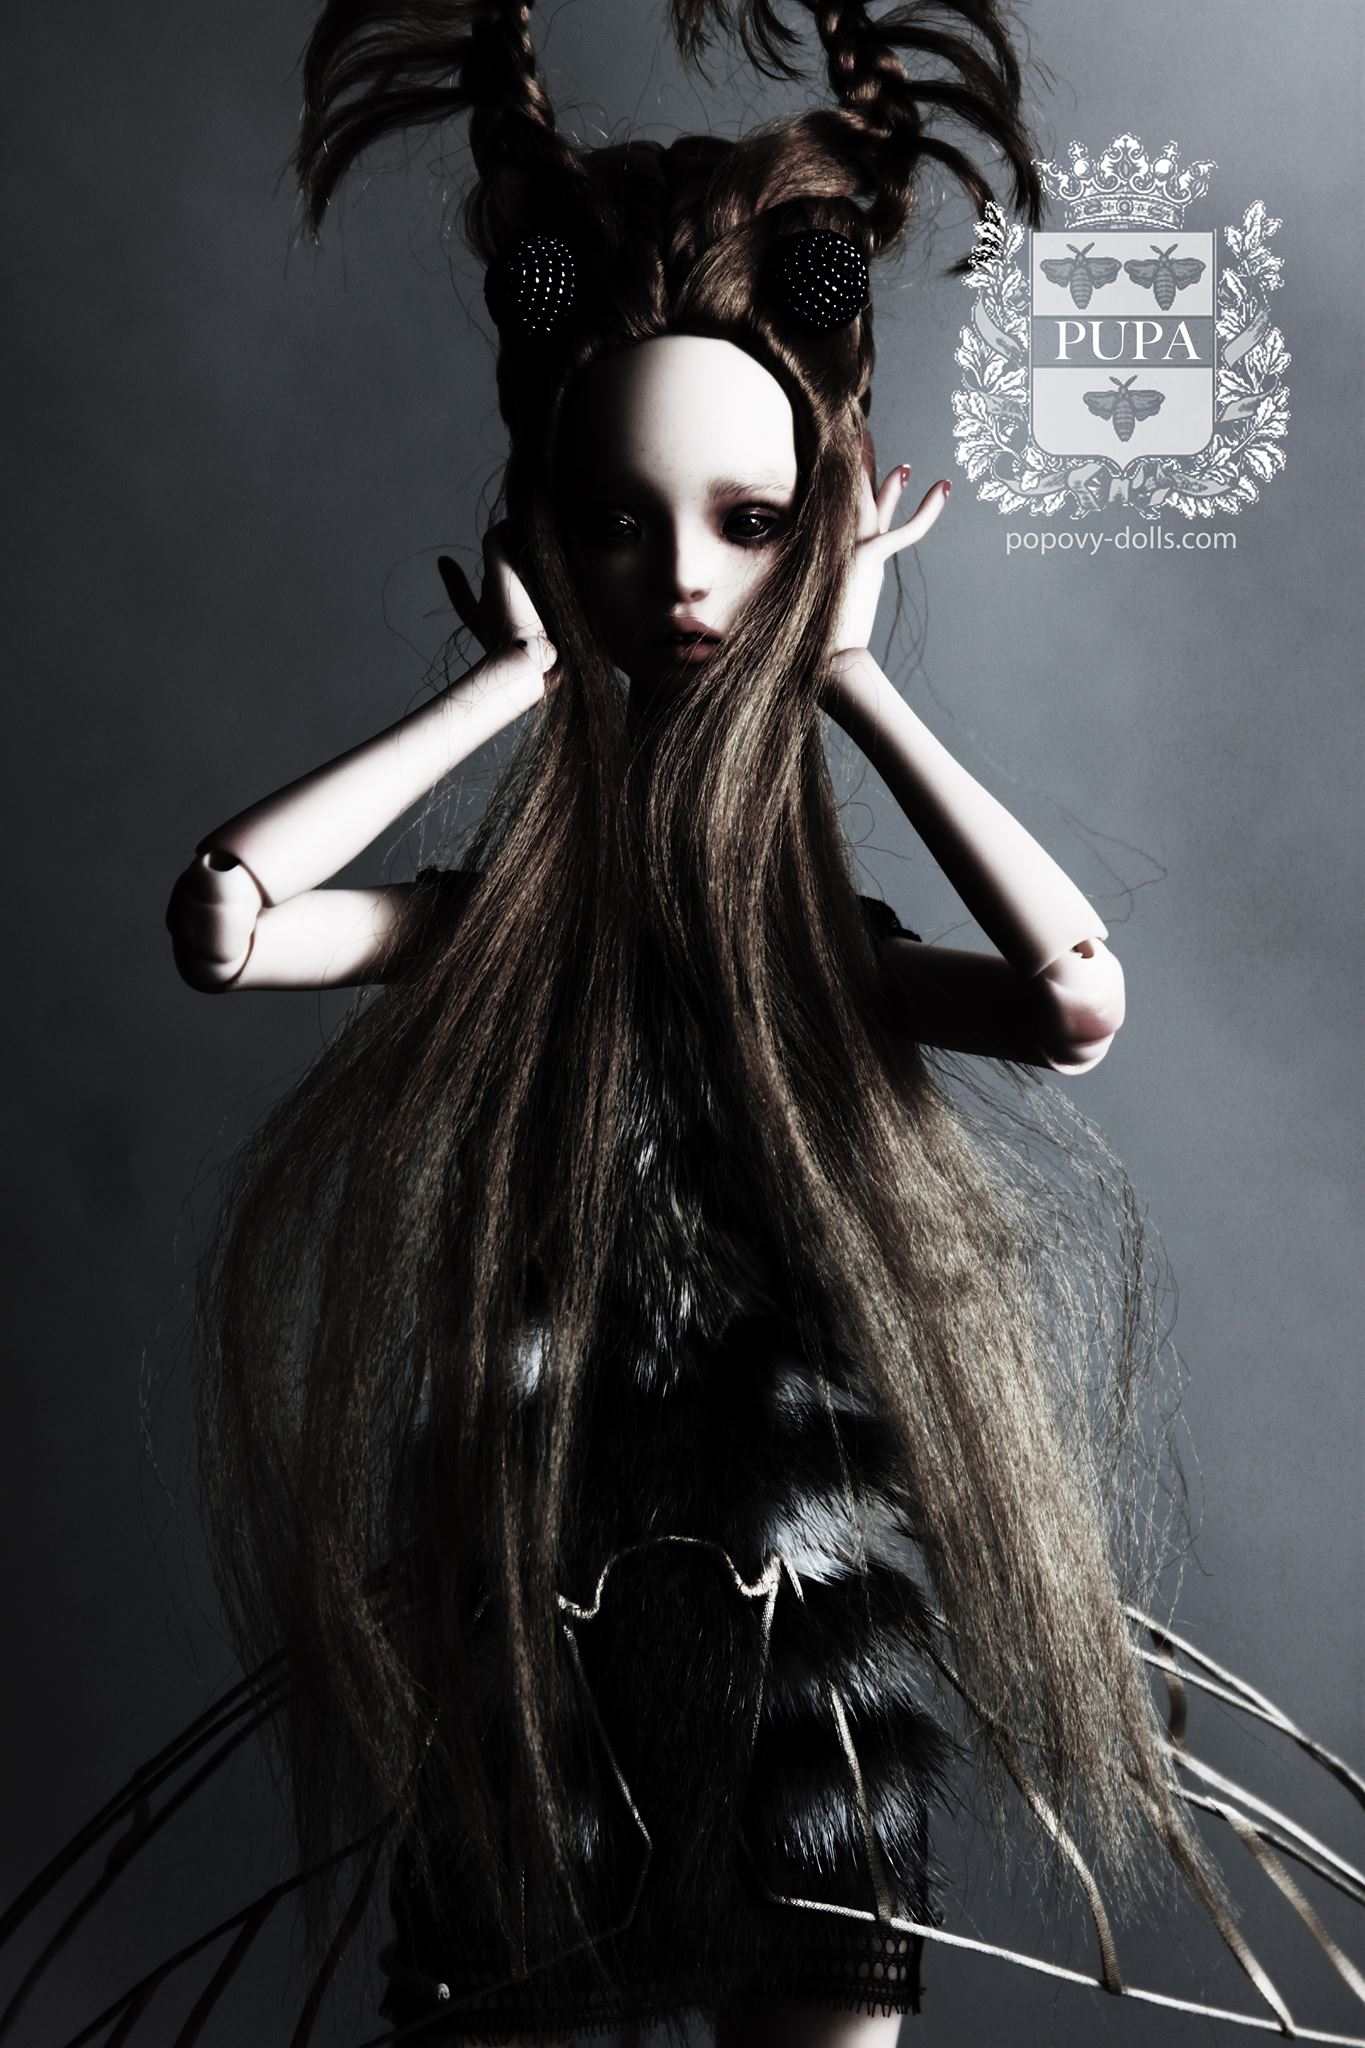 popovy-dolls – art dolls – www.popovy-dolls.com